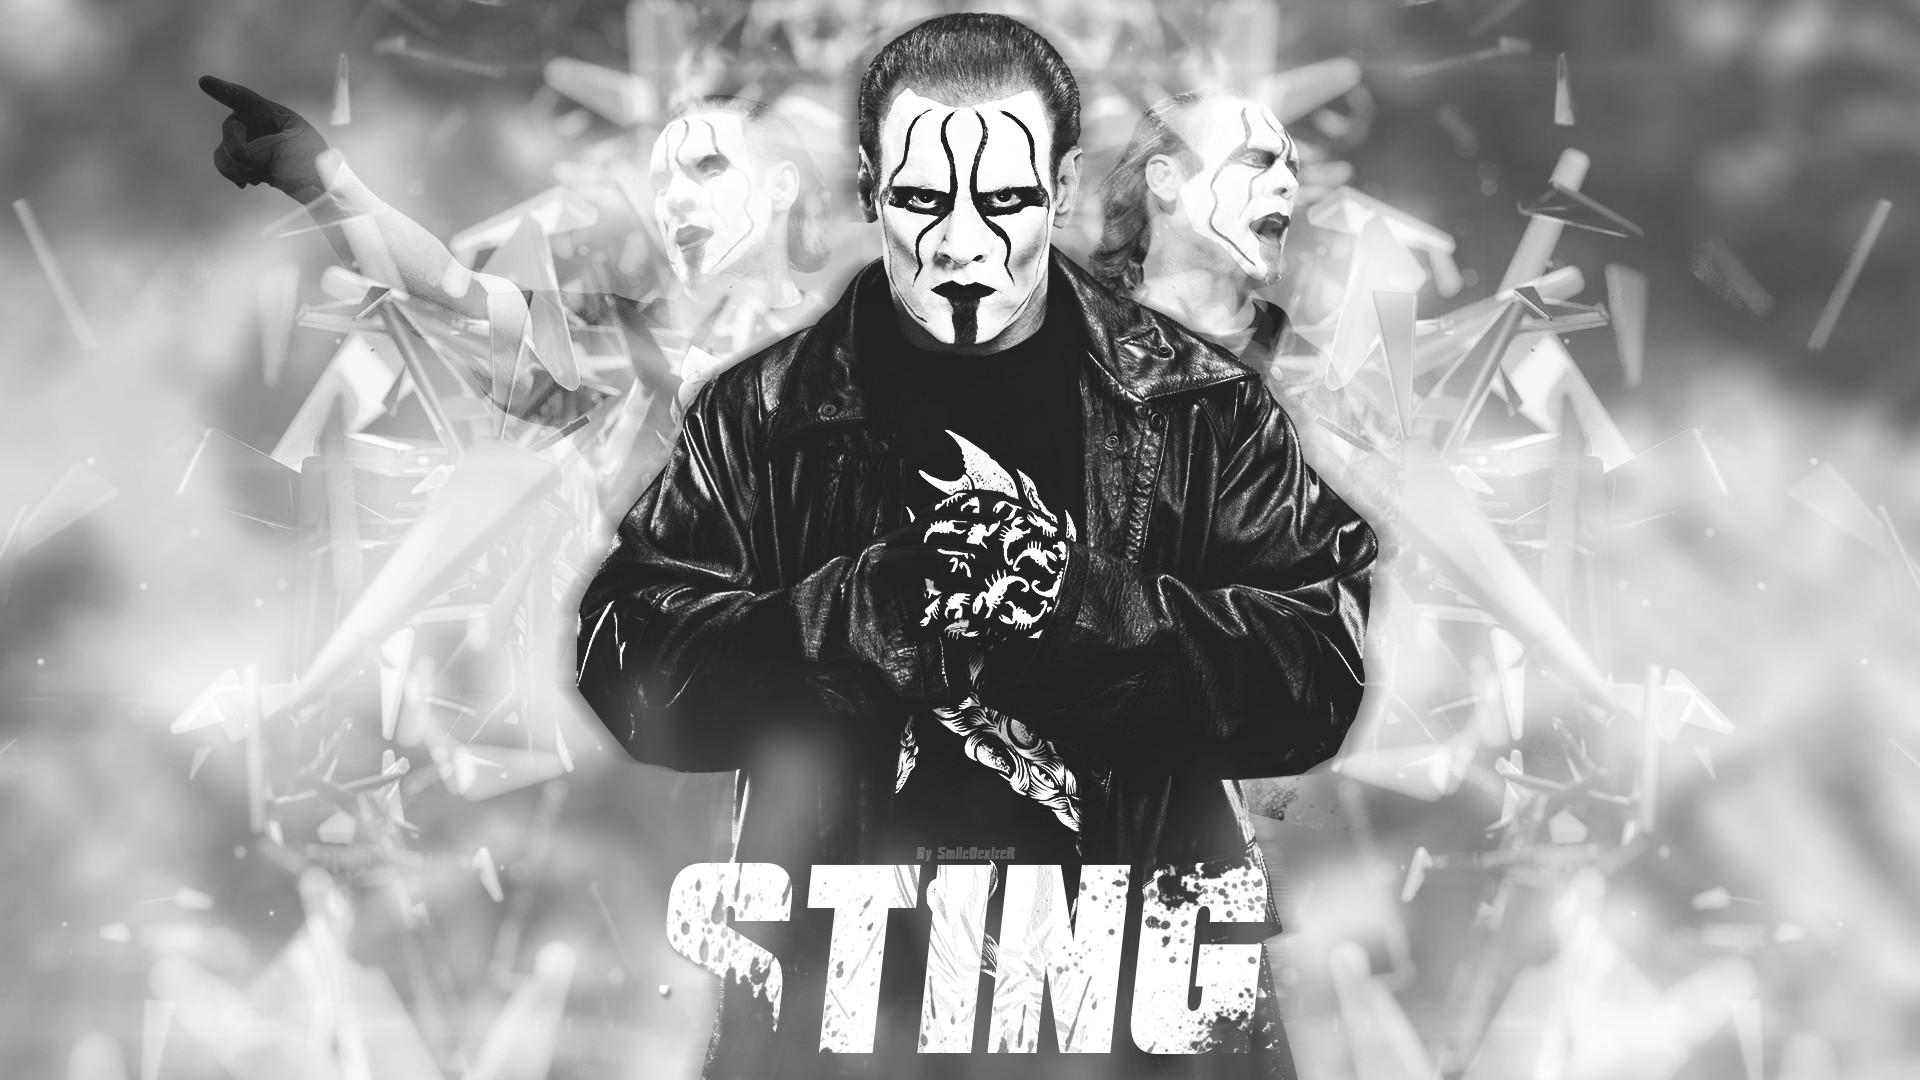 New WWE Wrestling Sting 2015 Wallpaper by SmileDexizeR on DeviantArt